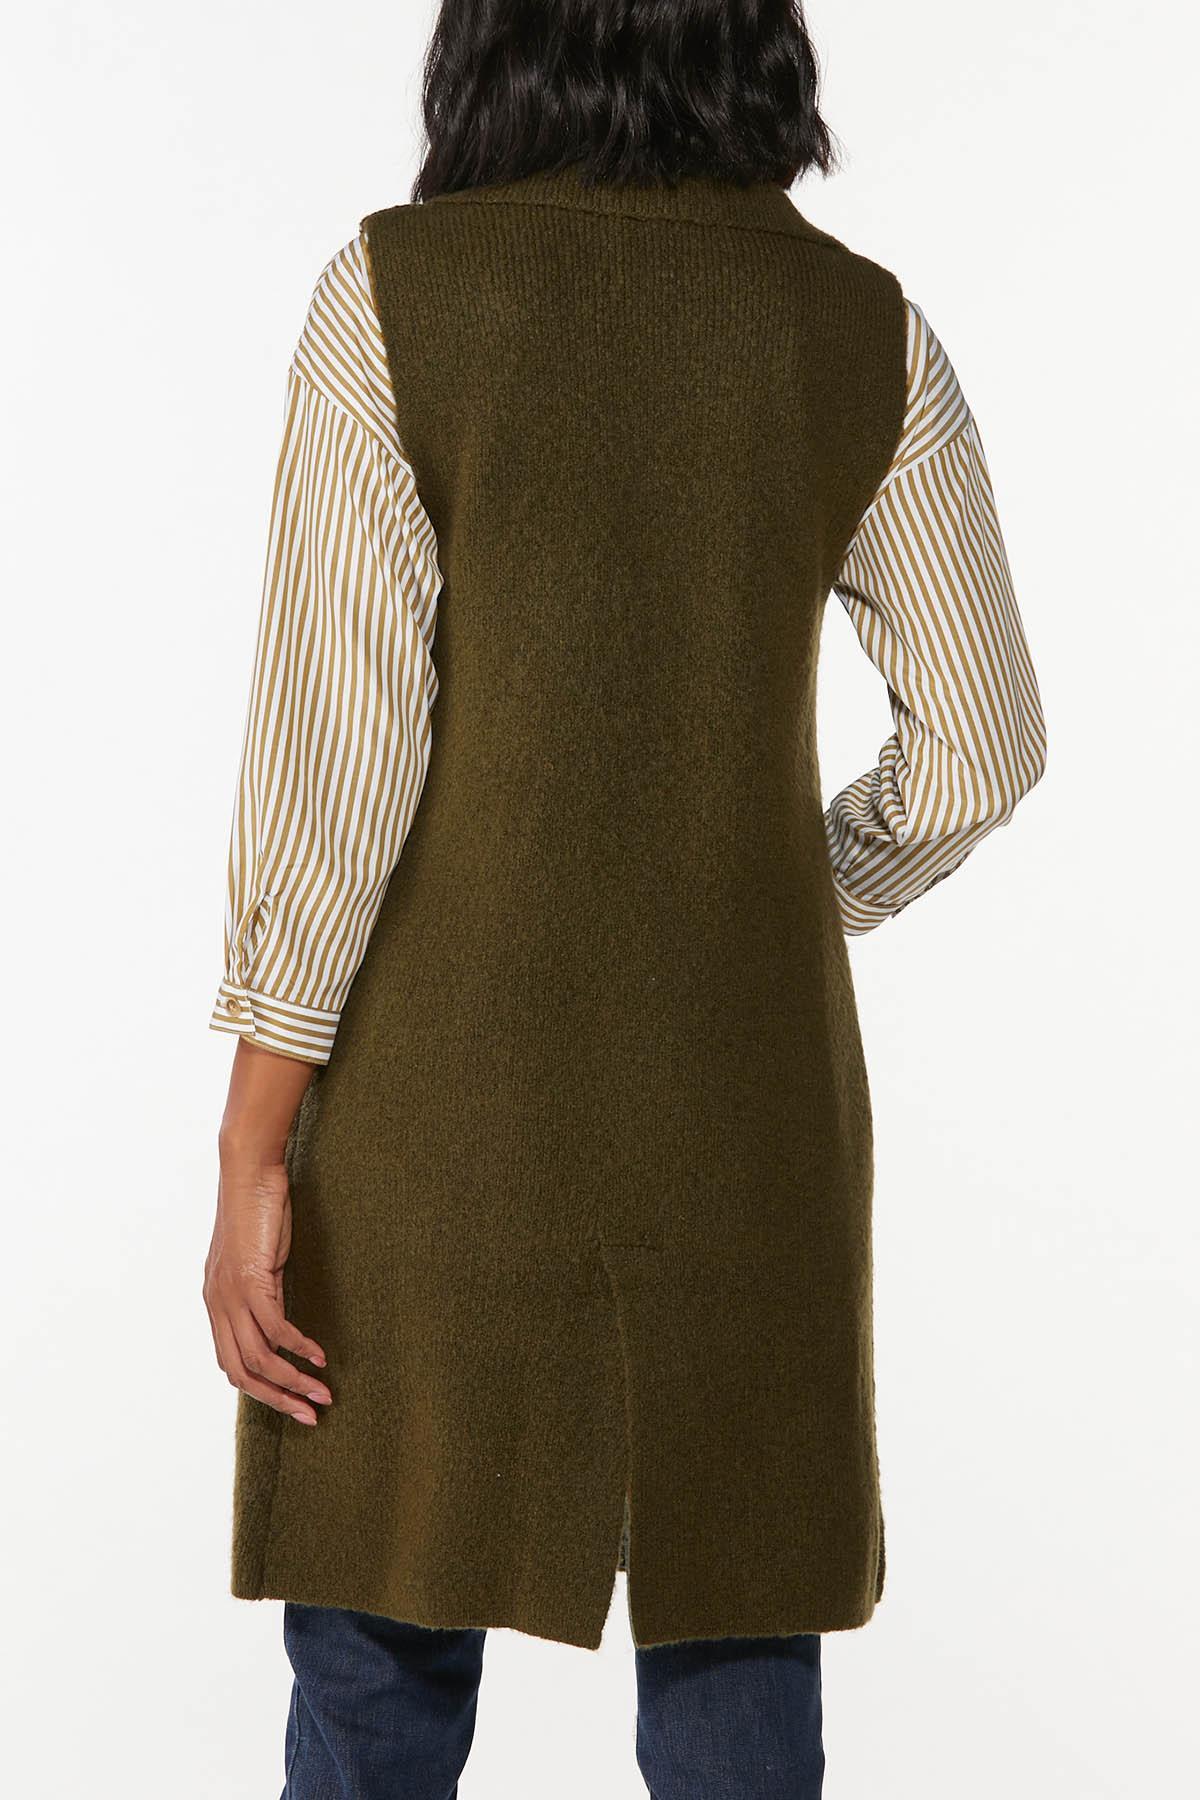 Olive Sweater Vest (Item #44746293)